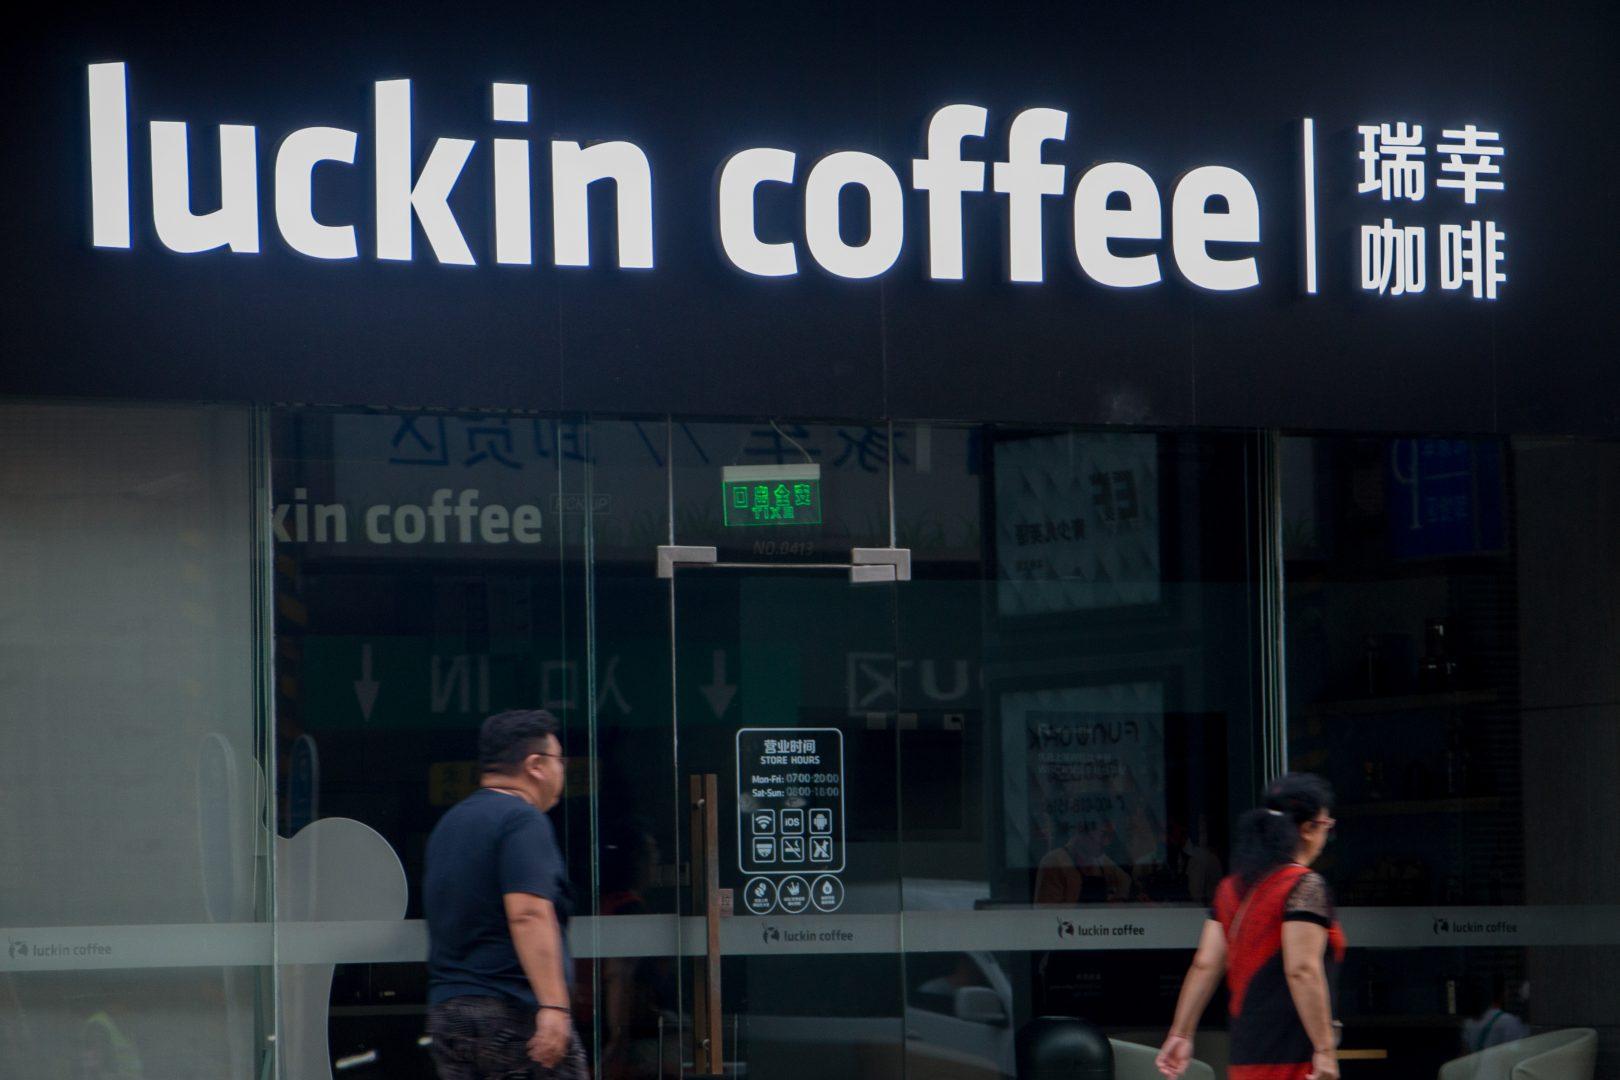 luckin-coffe-1